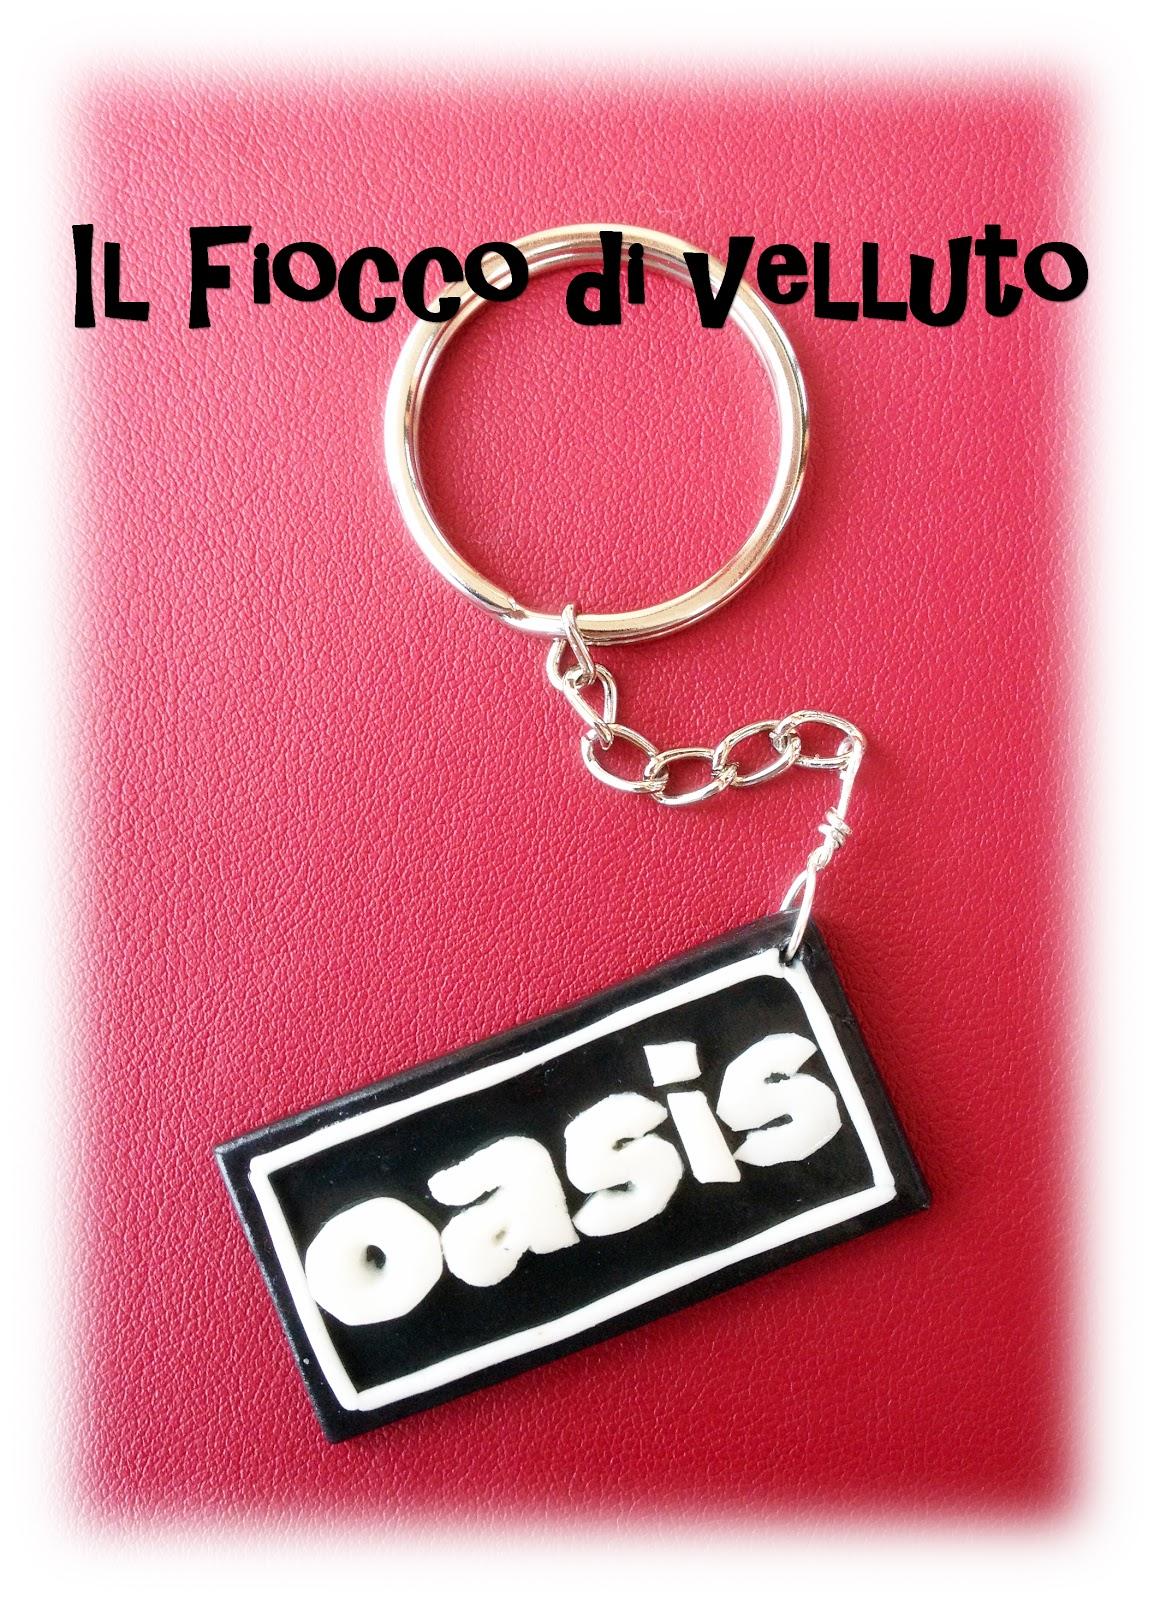 Portachiavi con logo degli Oasis Oasis